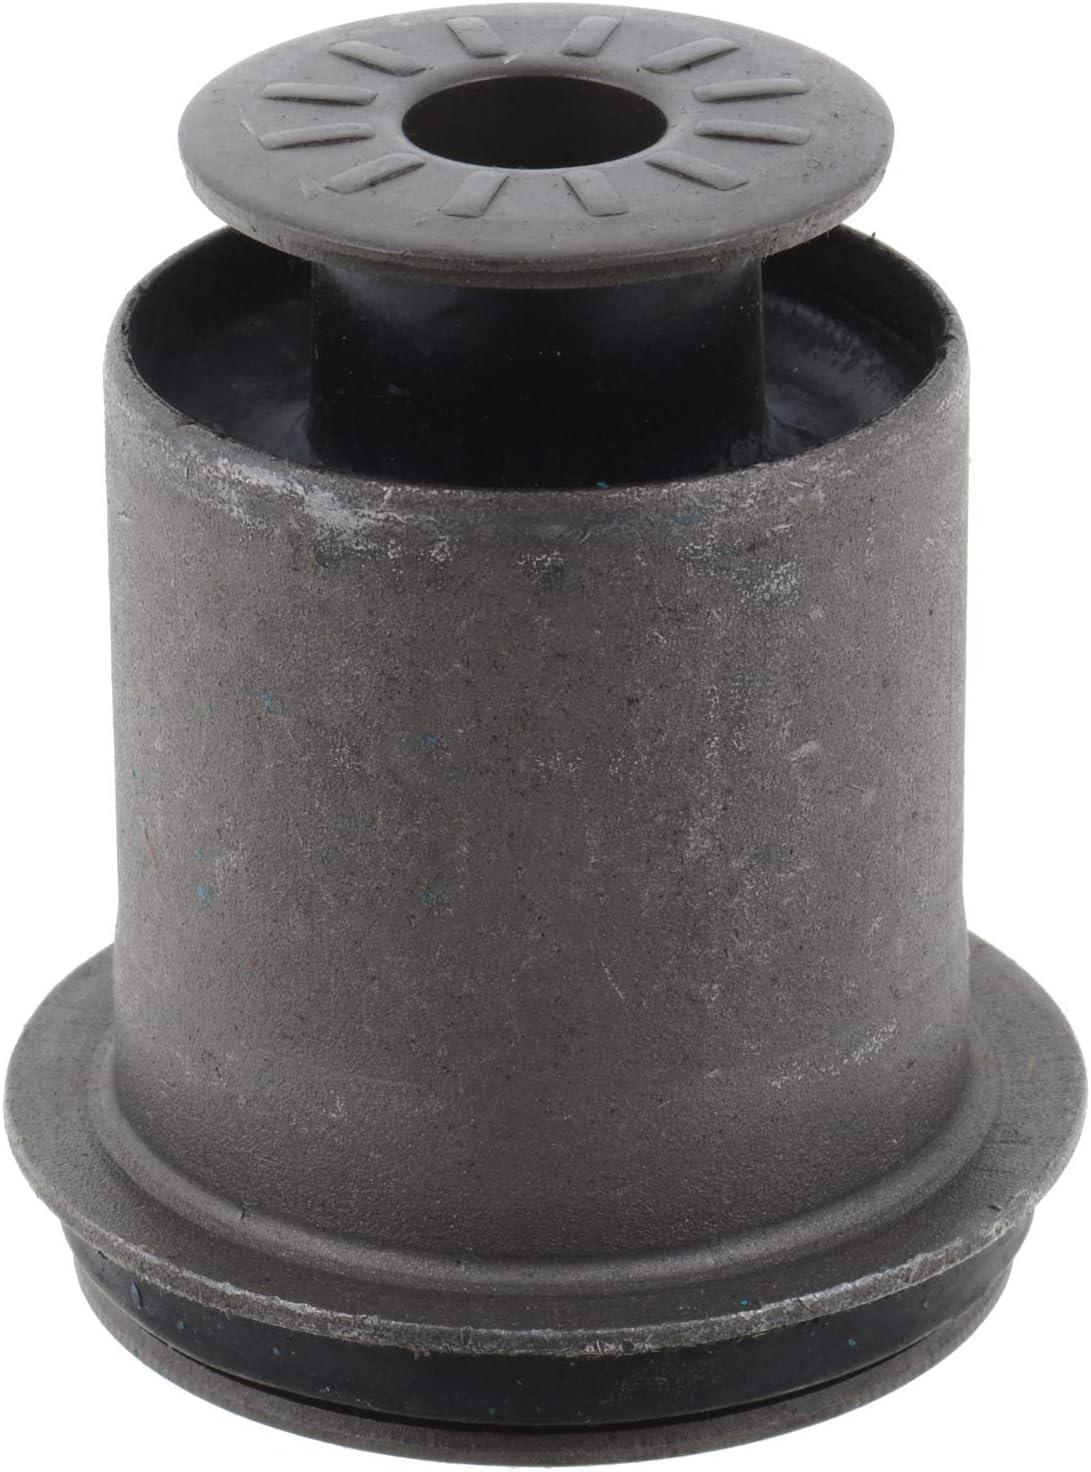 TRW Automotive JBU1836 Bushing Kit Control Arm